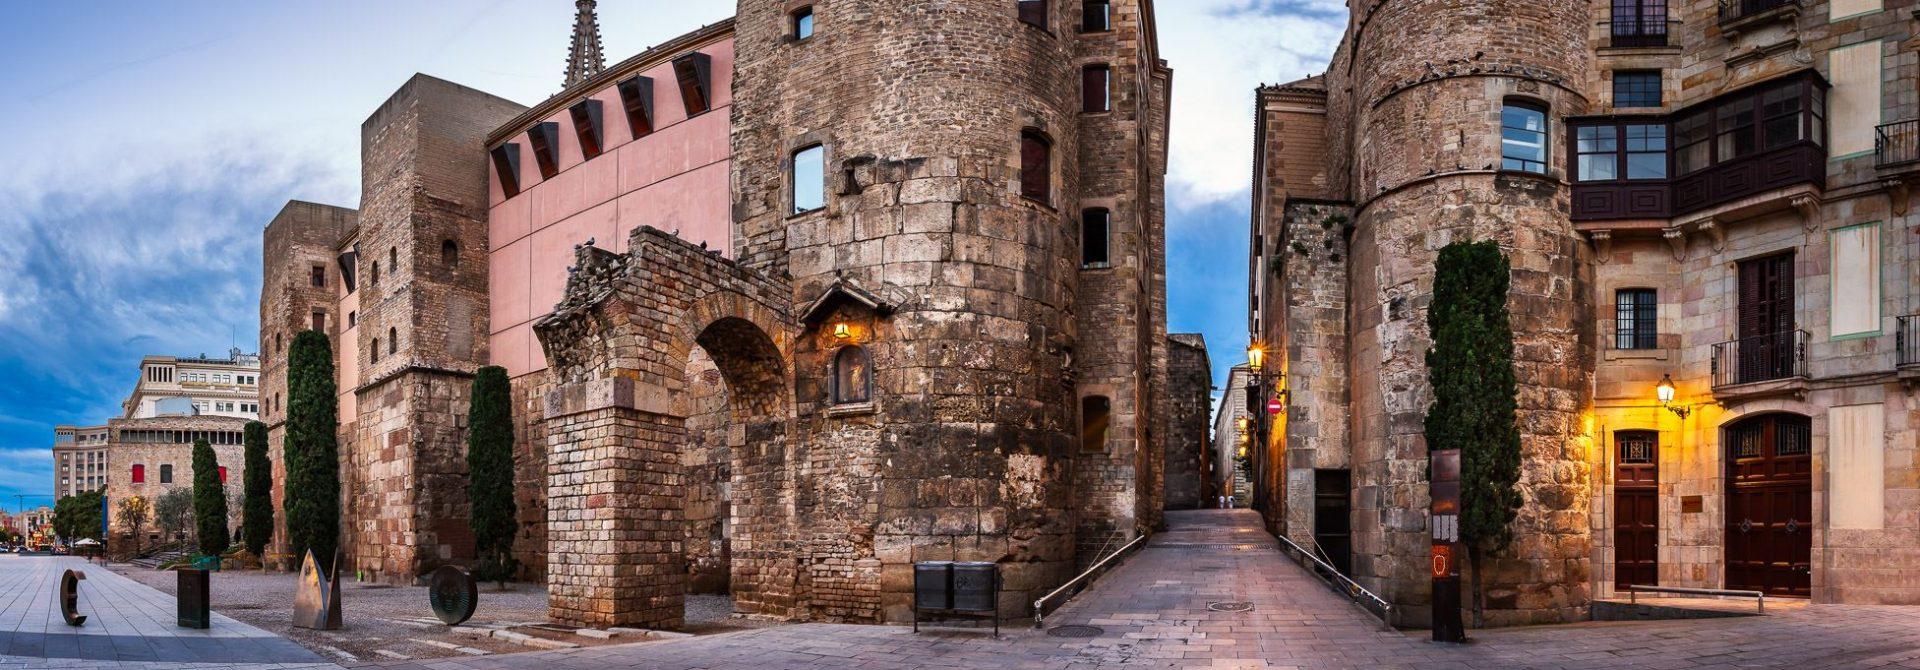 Barcelona Free Walking Tours